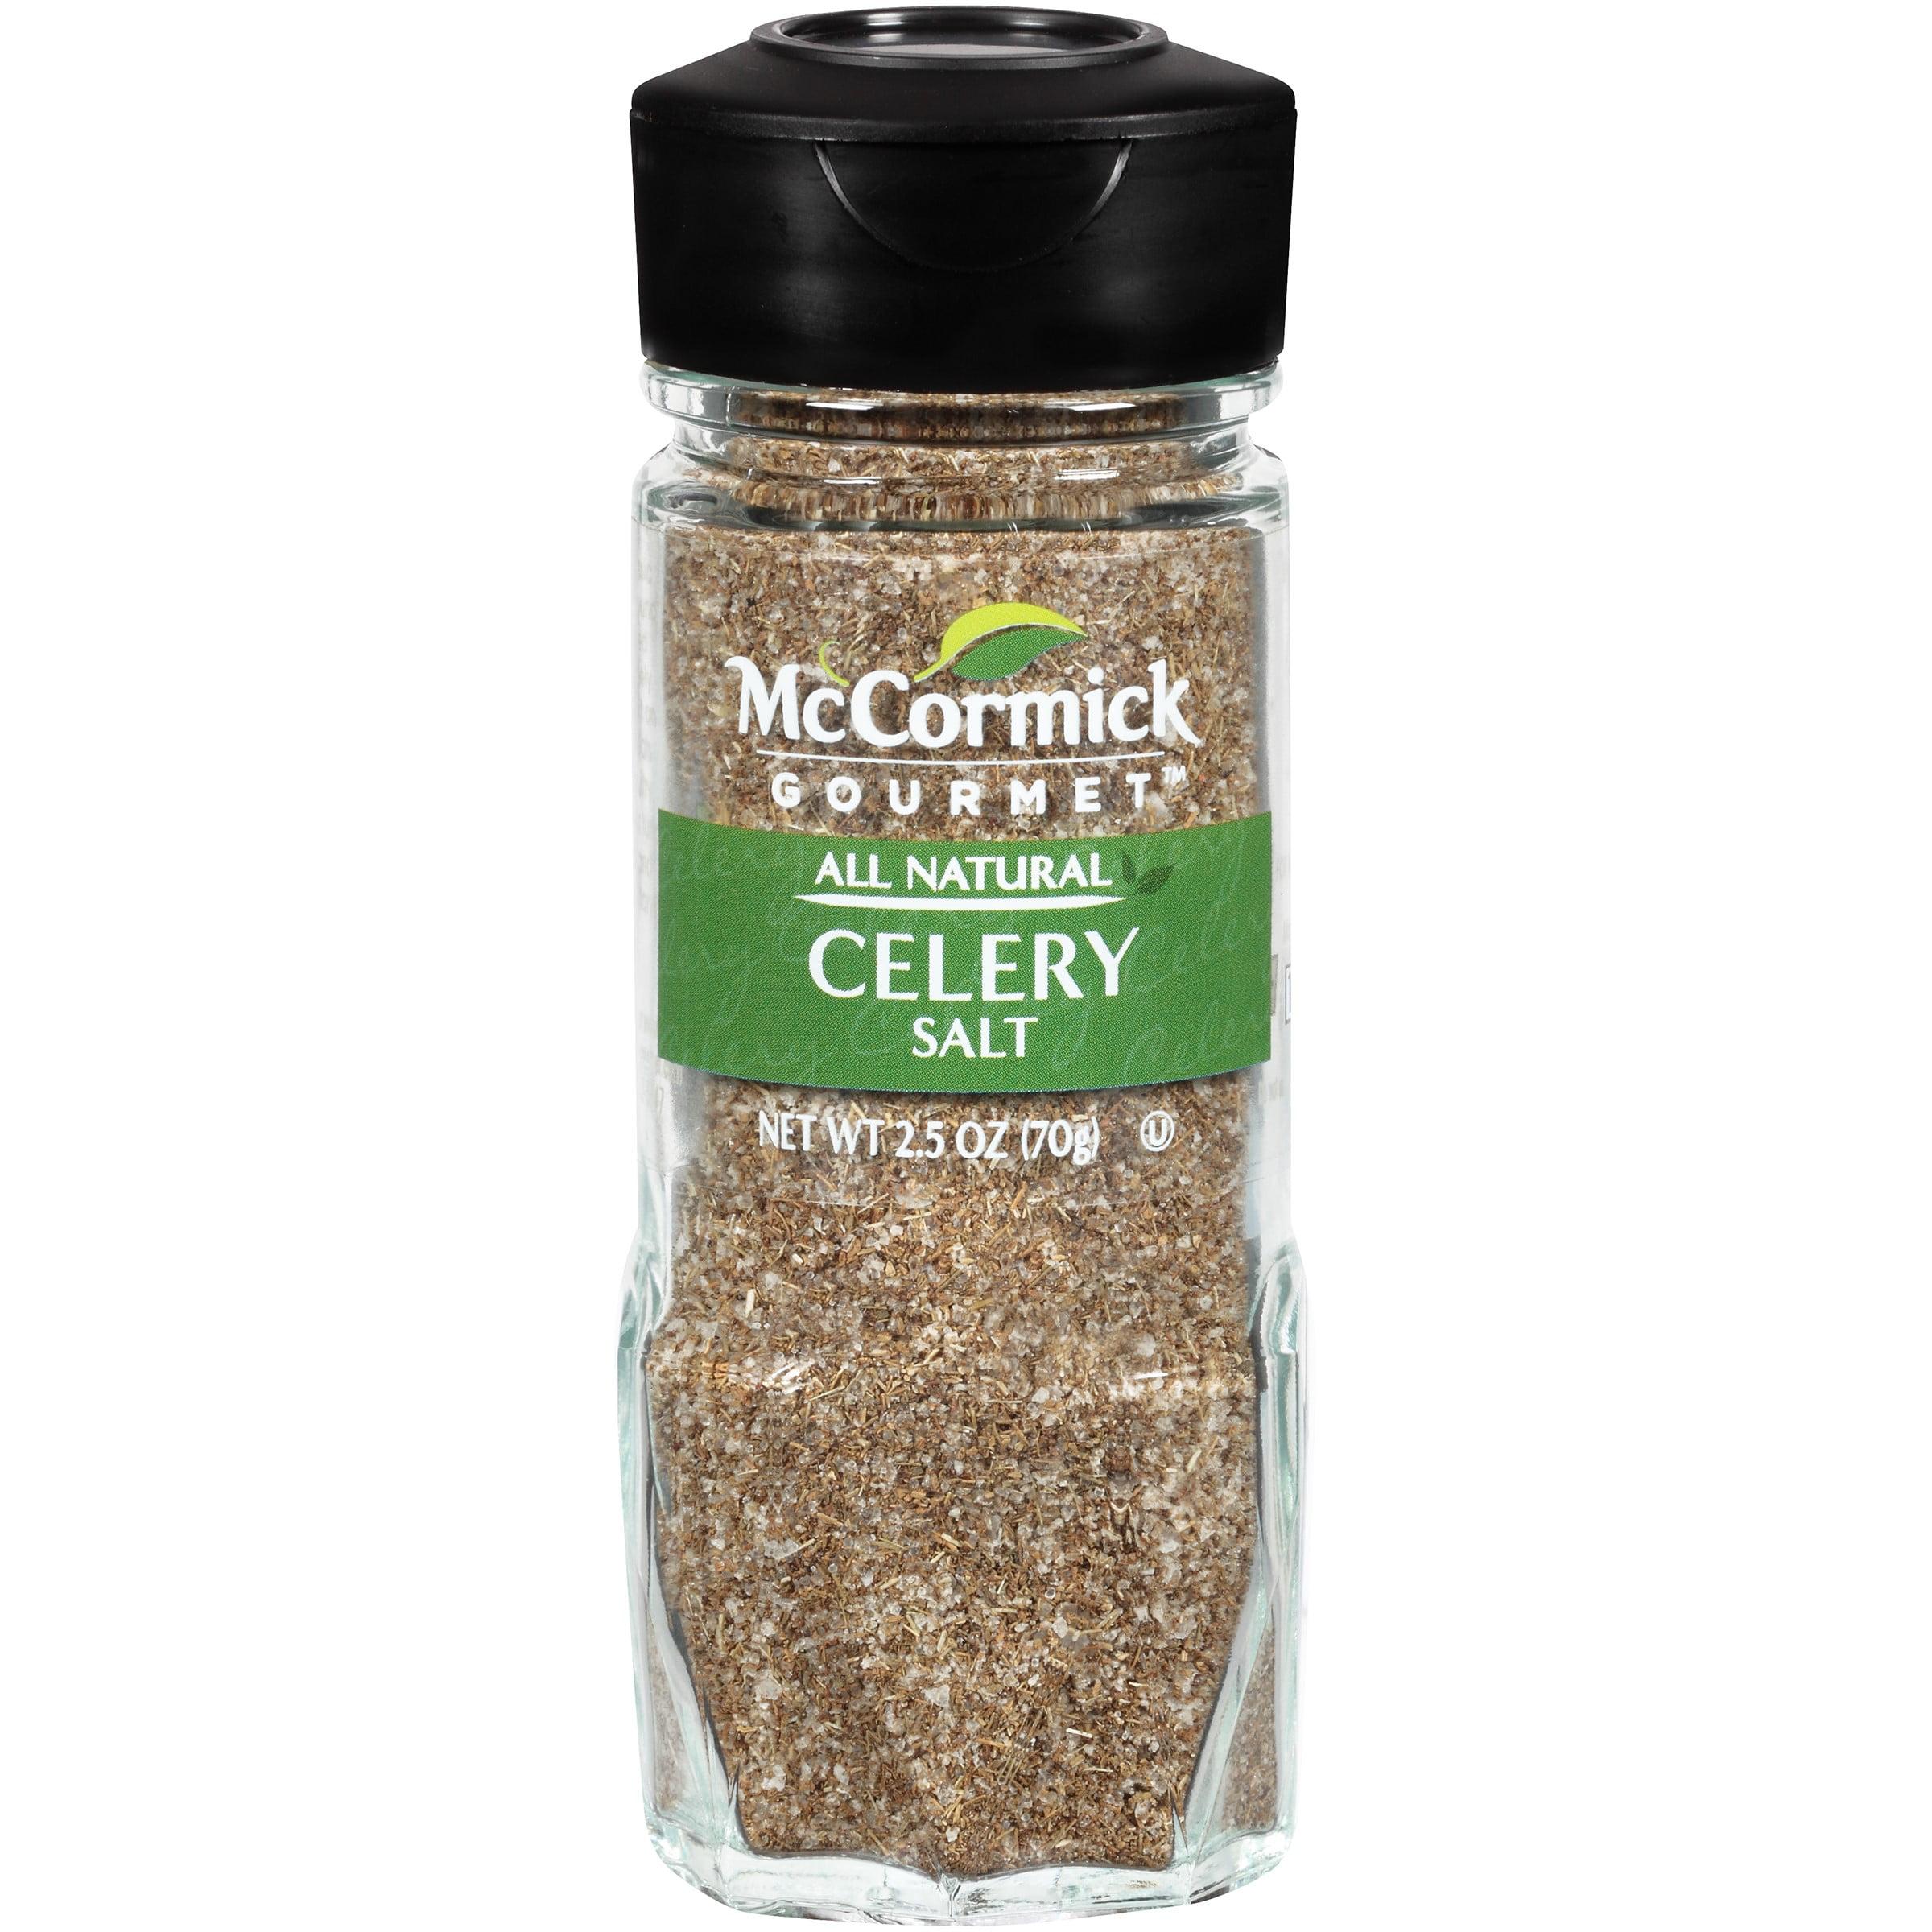 McCormick Gourmet Celery Salt, 2.5 Ounce